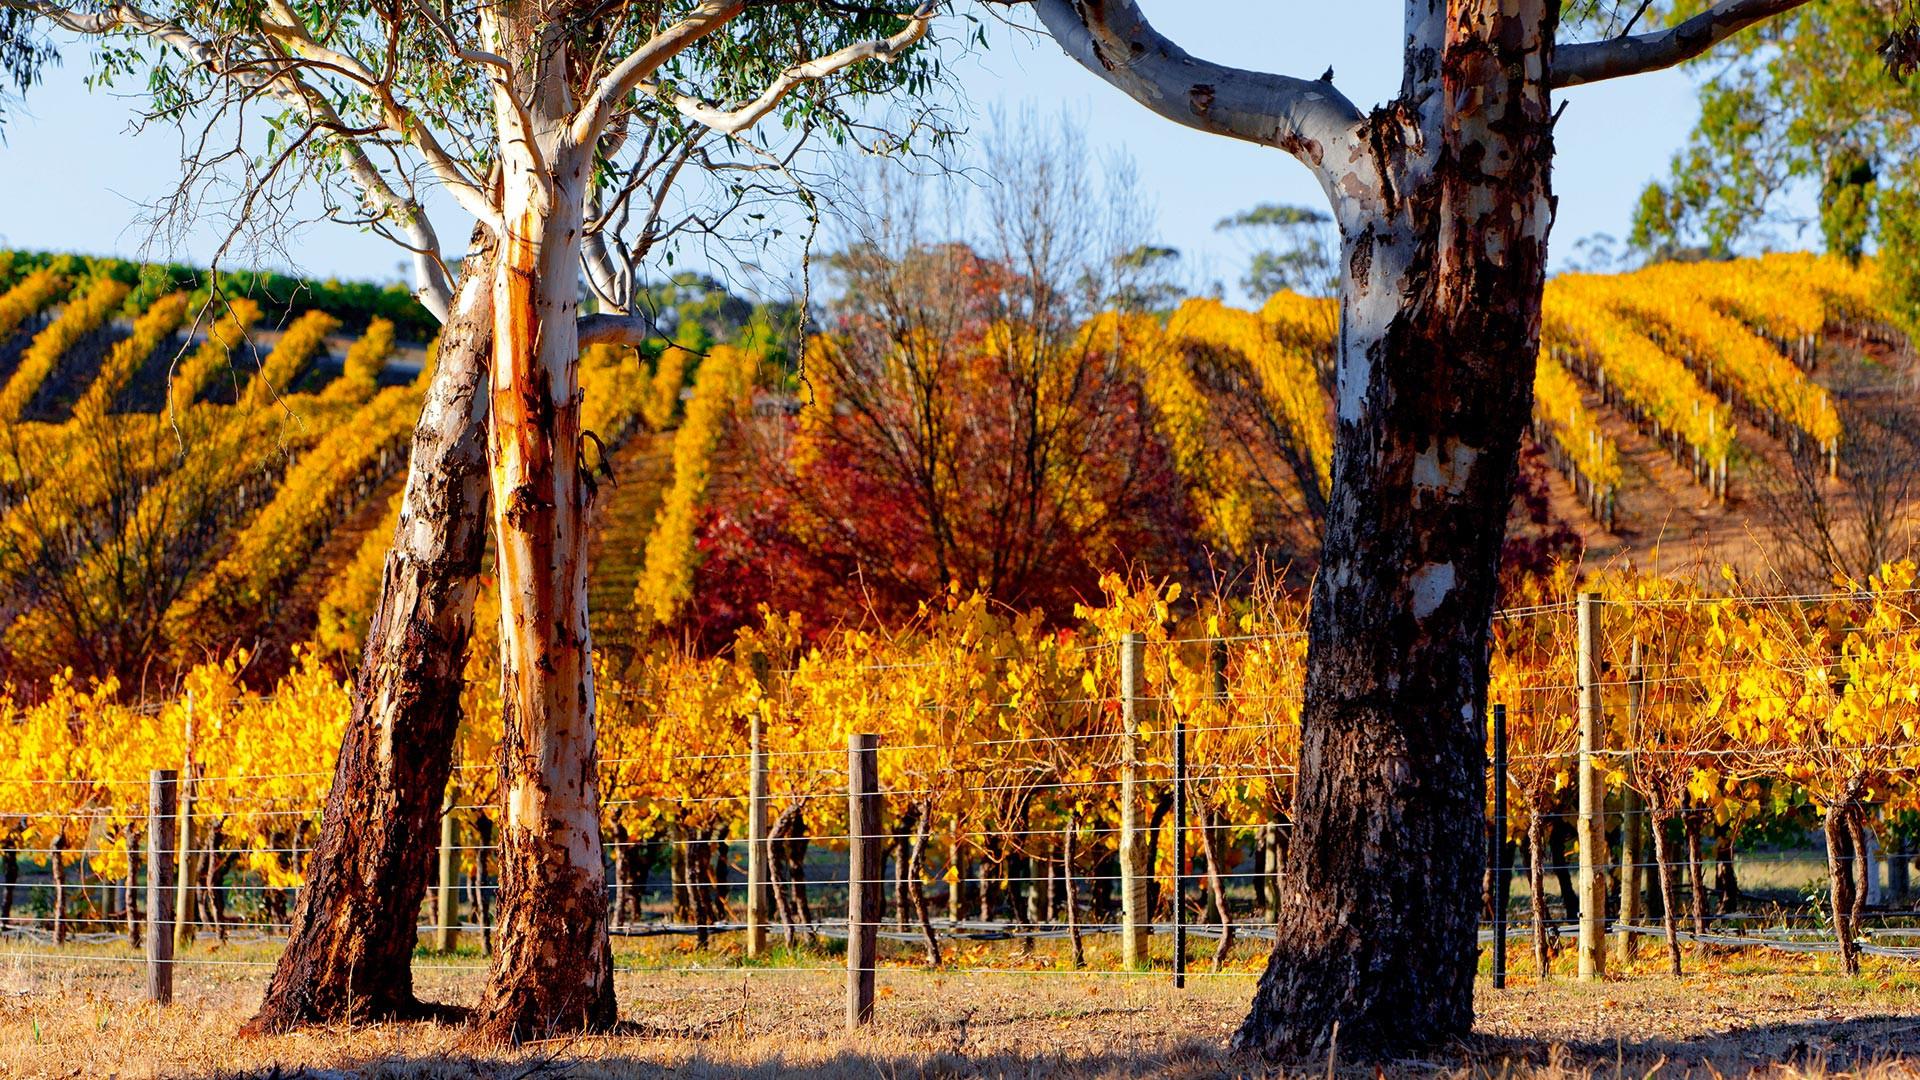 South Australia's wine making regions